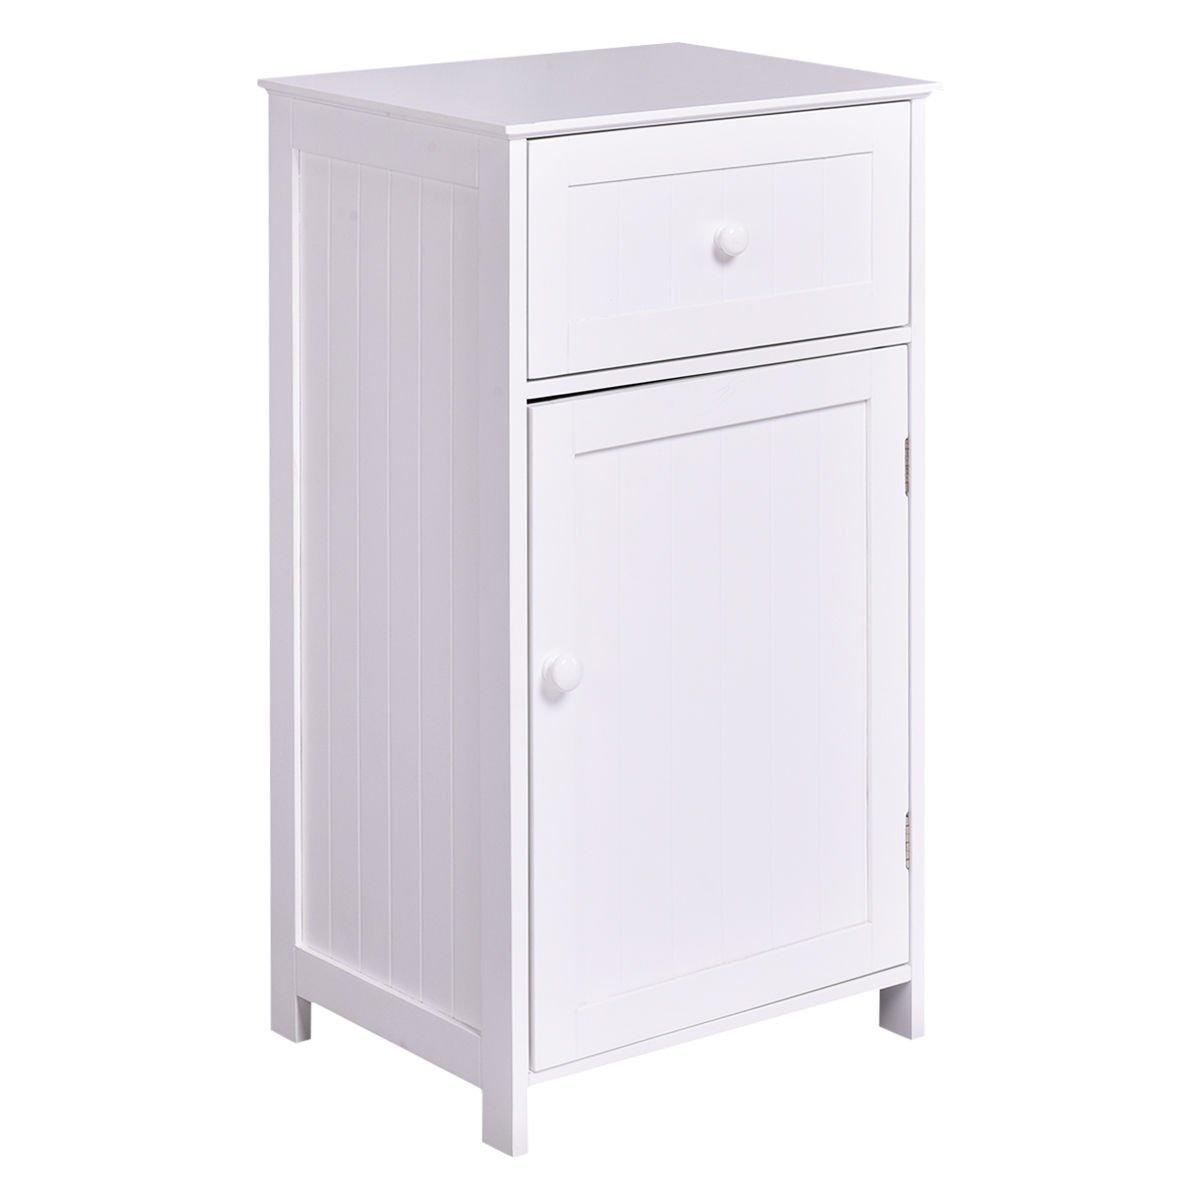 TANGKULA Bathroom Floor Storage Cabinet Home Living Room Bedroom Sturdy Wooden Modern Side Cabinet Organizer Storage Cabinet Furniture with Door & Drawer